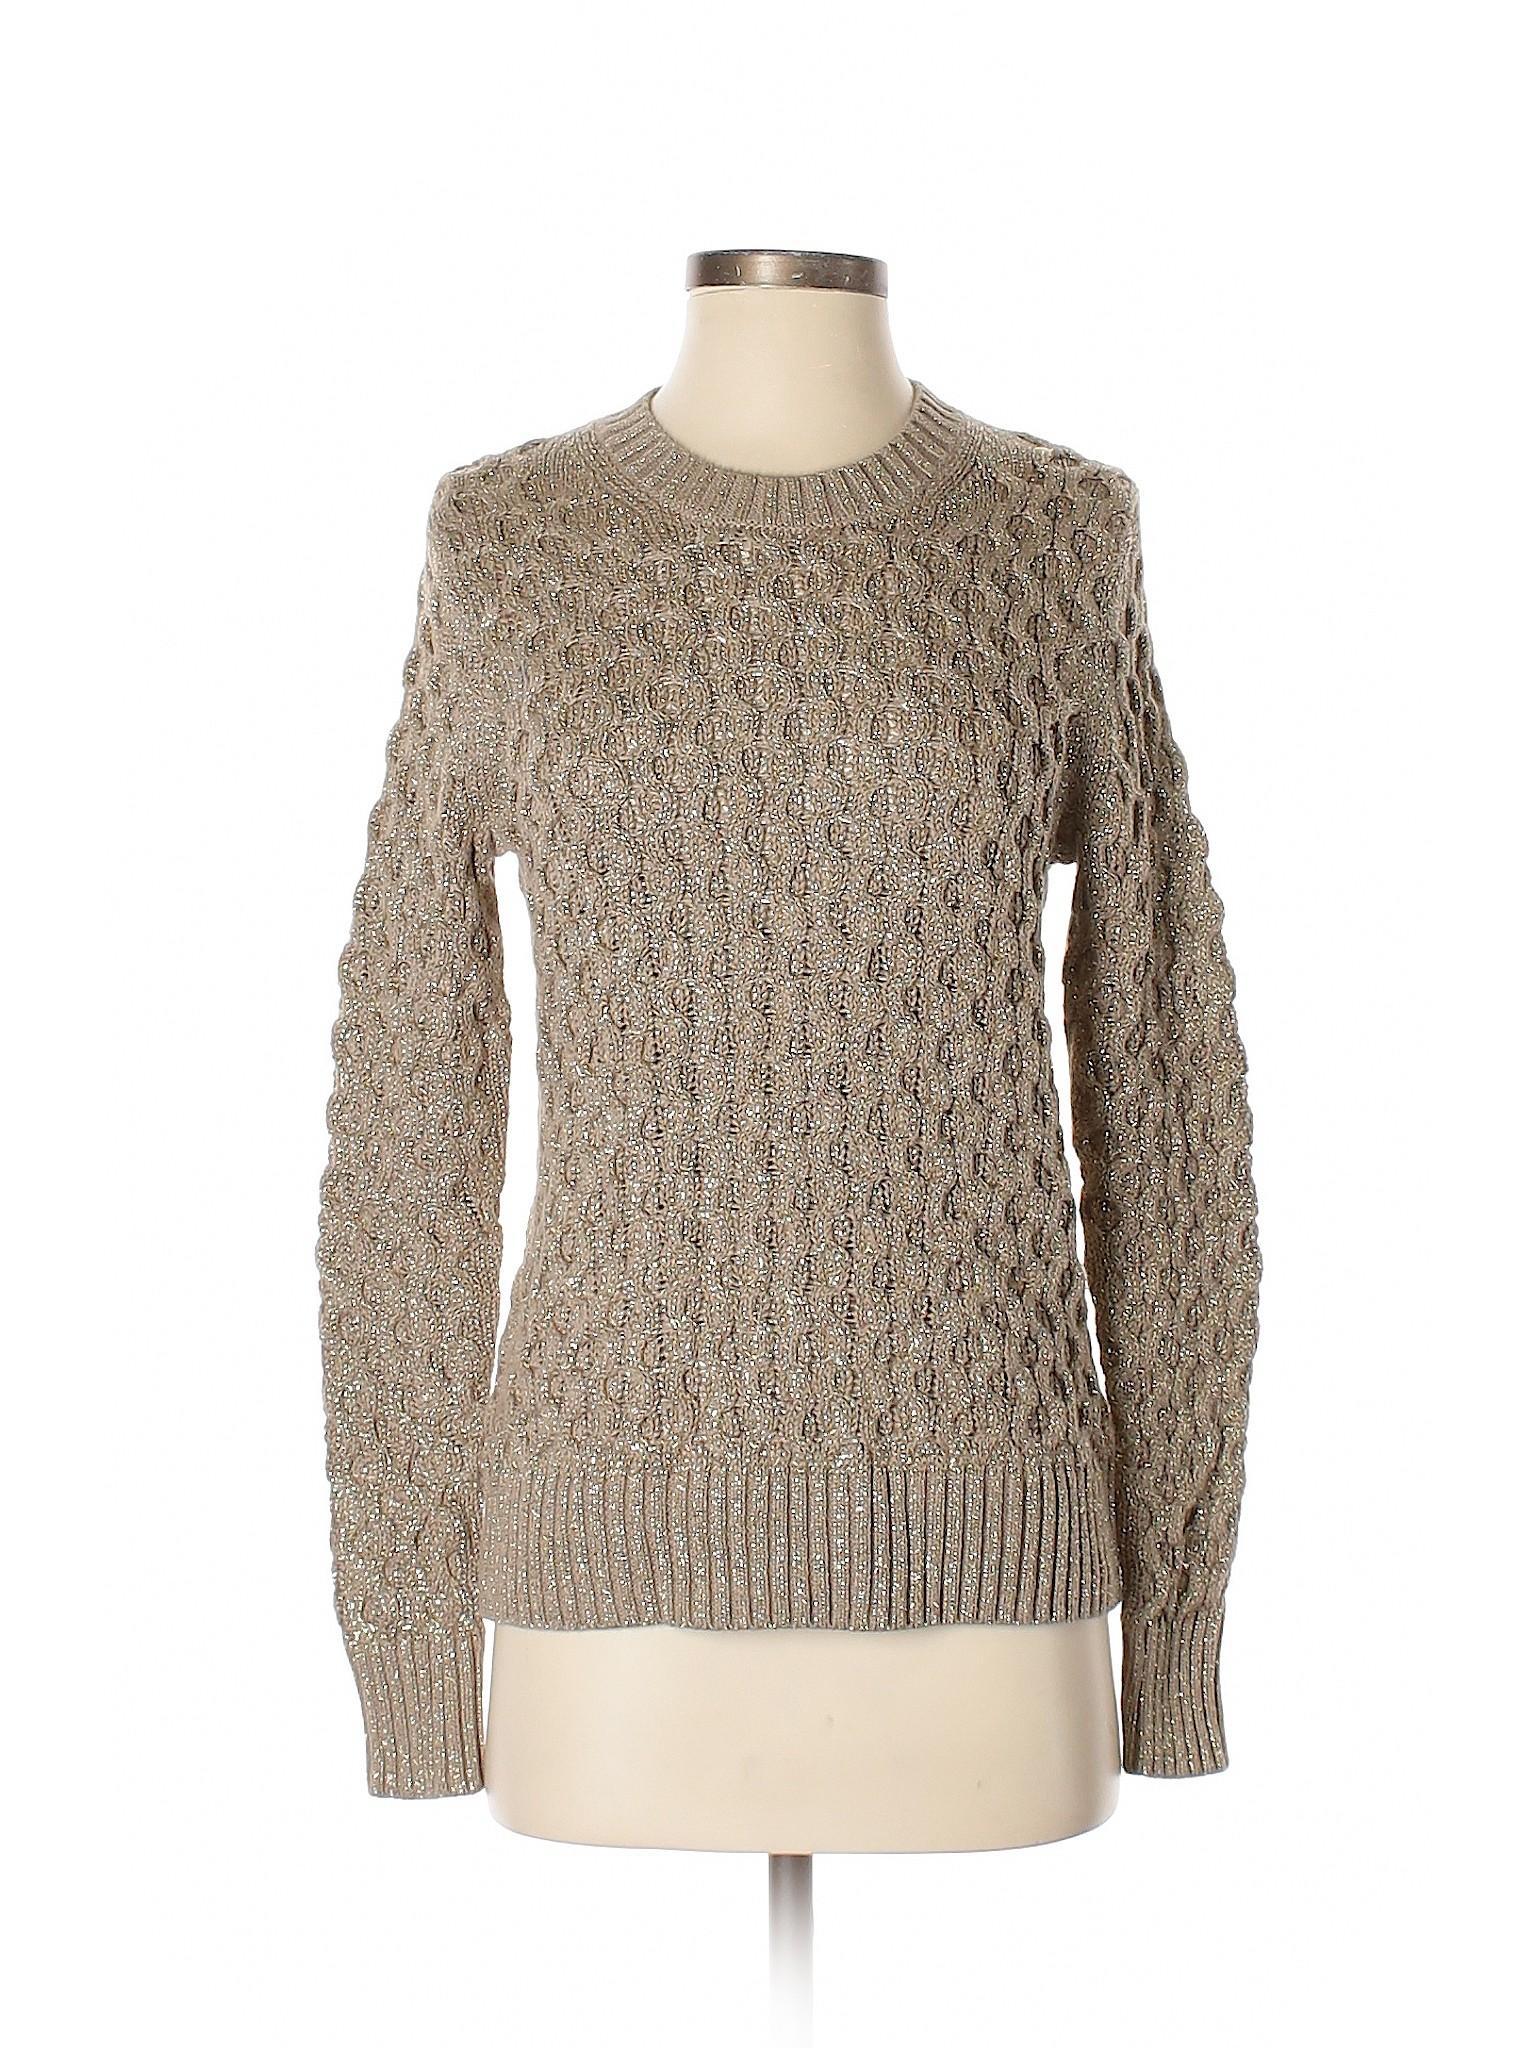 Crew Pullover Crew Sweater J Boutique Pullover J Boutique Sweater 6CZnqFSwxn